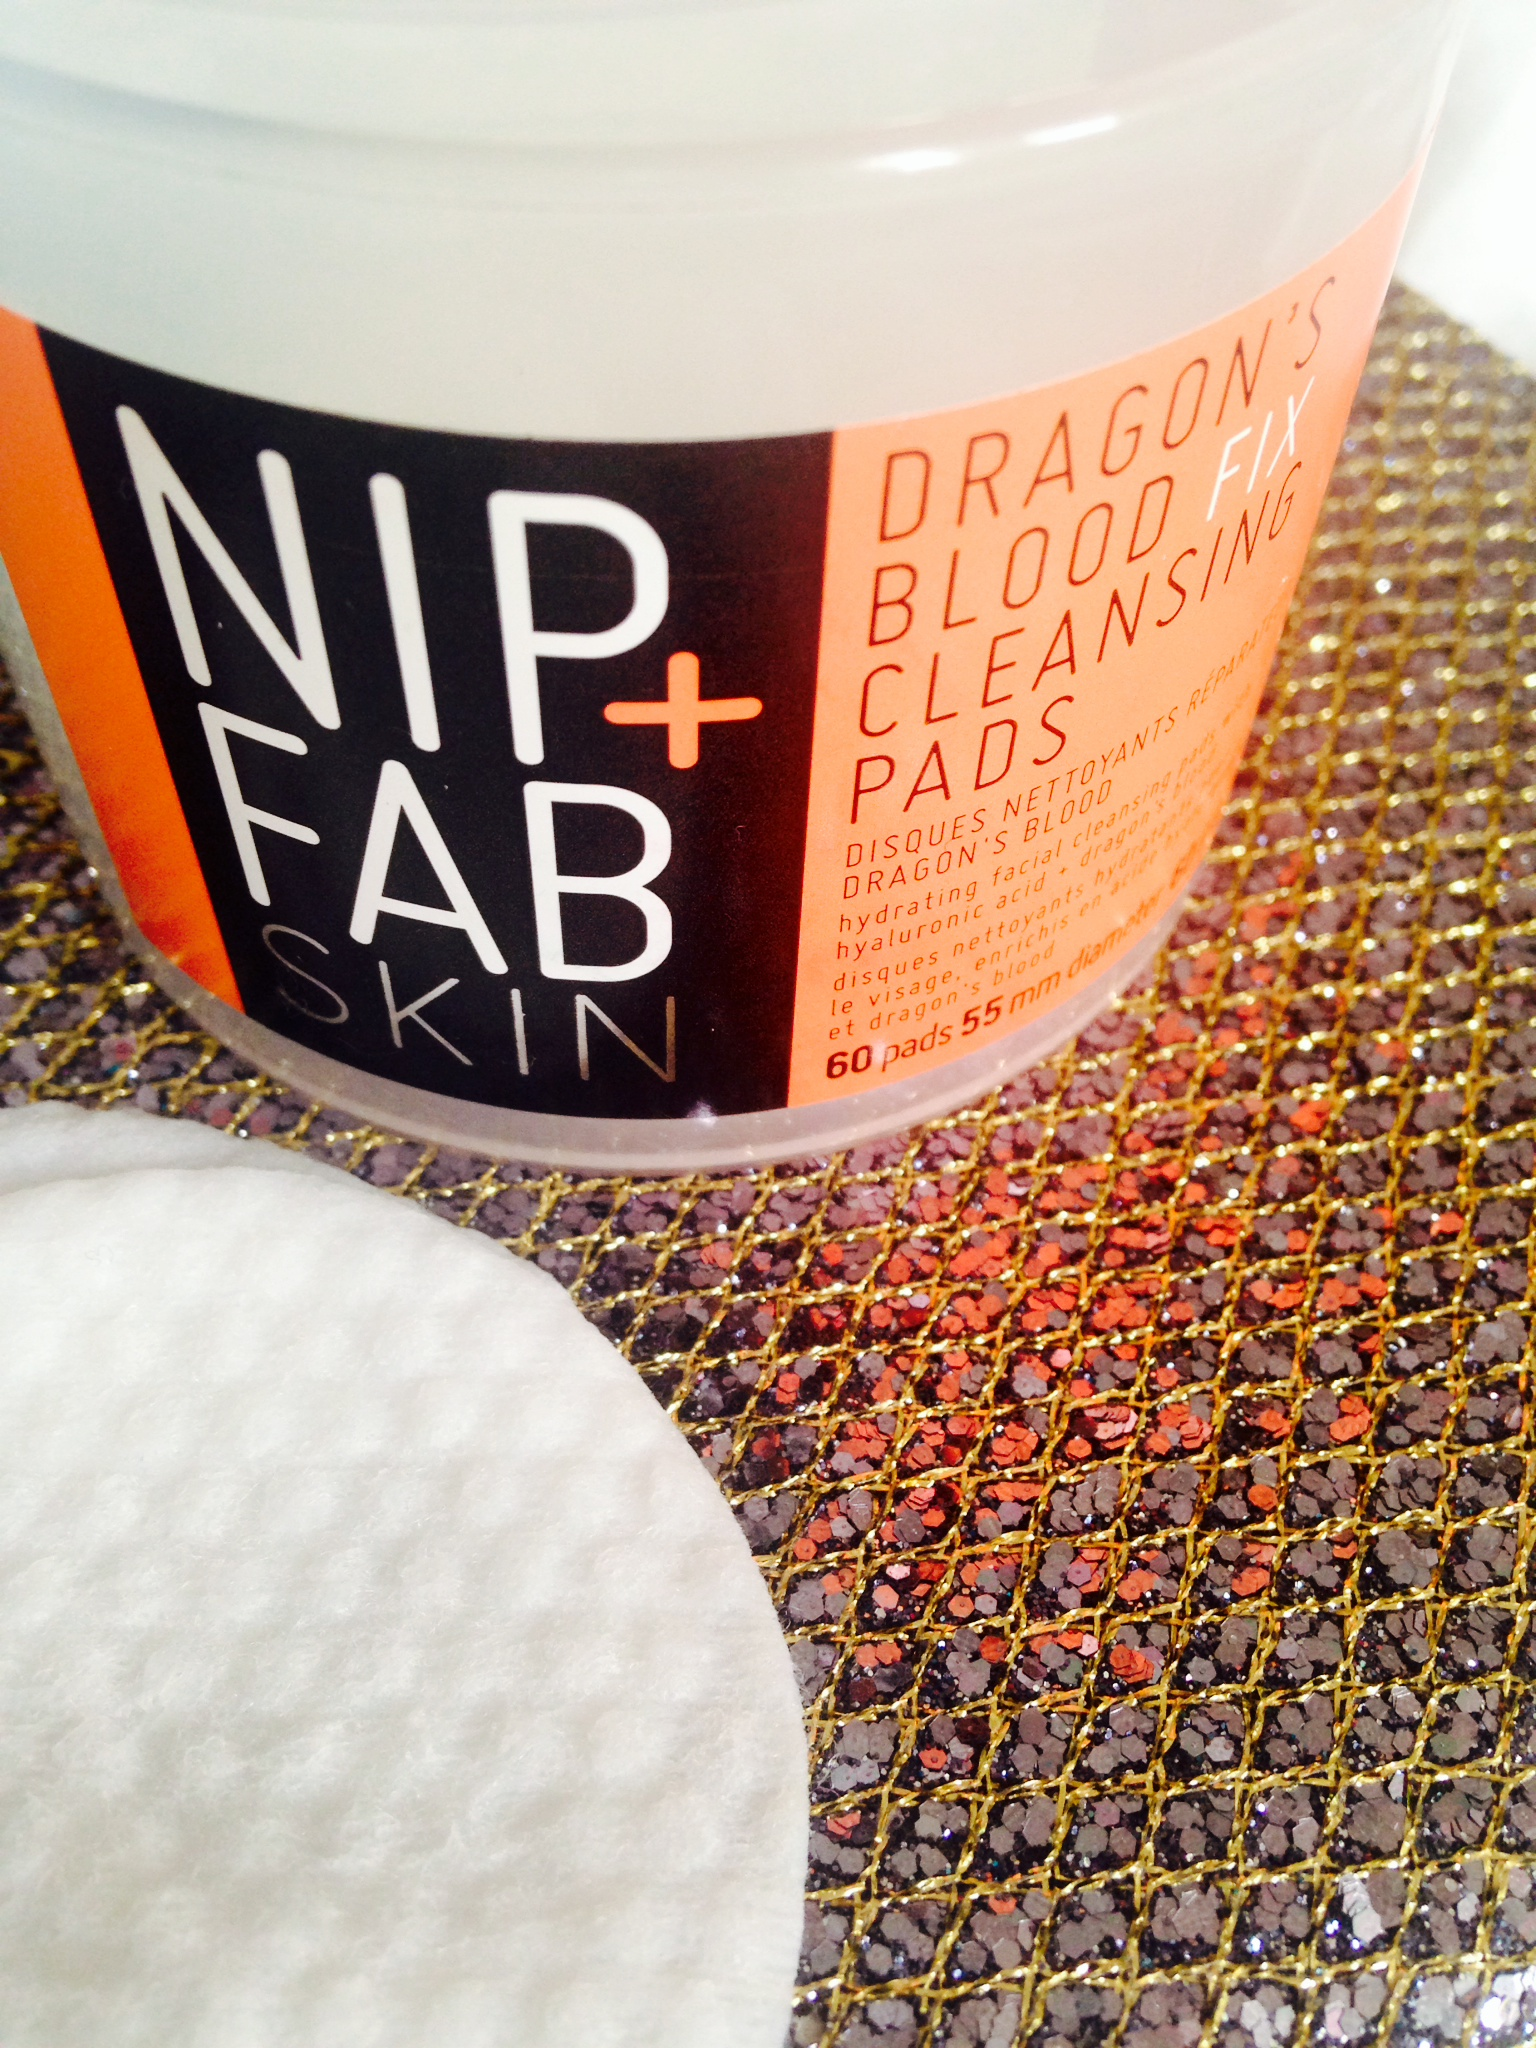 Nip+Fab-Dragon's-Blood-Fix-Cleansing-Pads